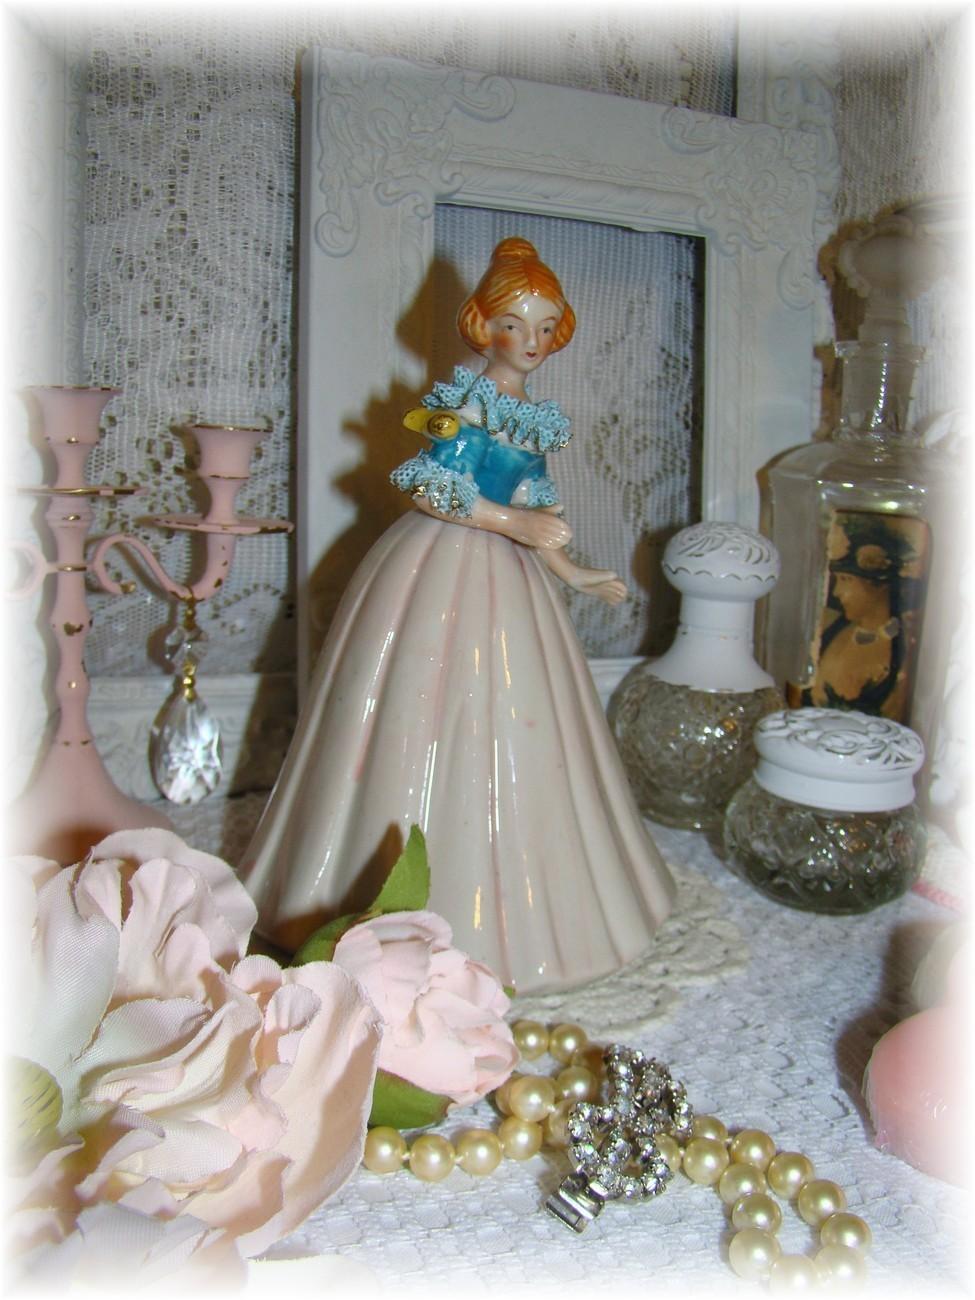 Shabby n' Chic Vintage Victorian Lady w/Bird Figurine